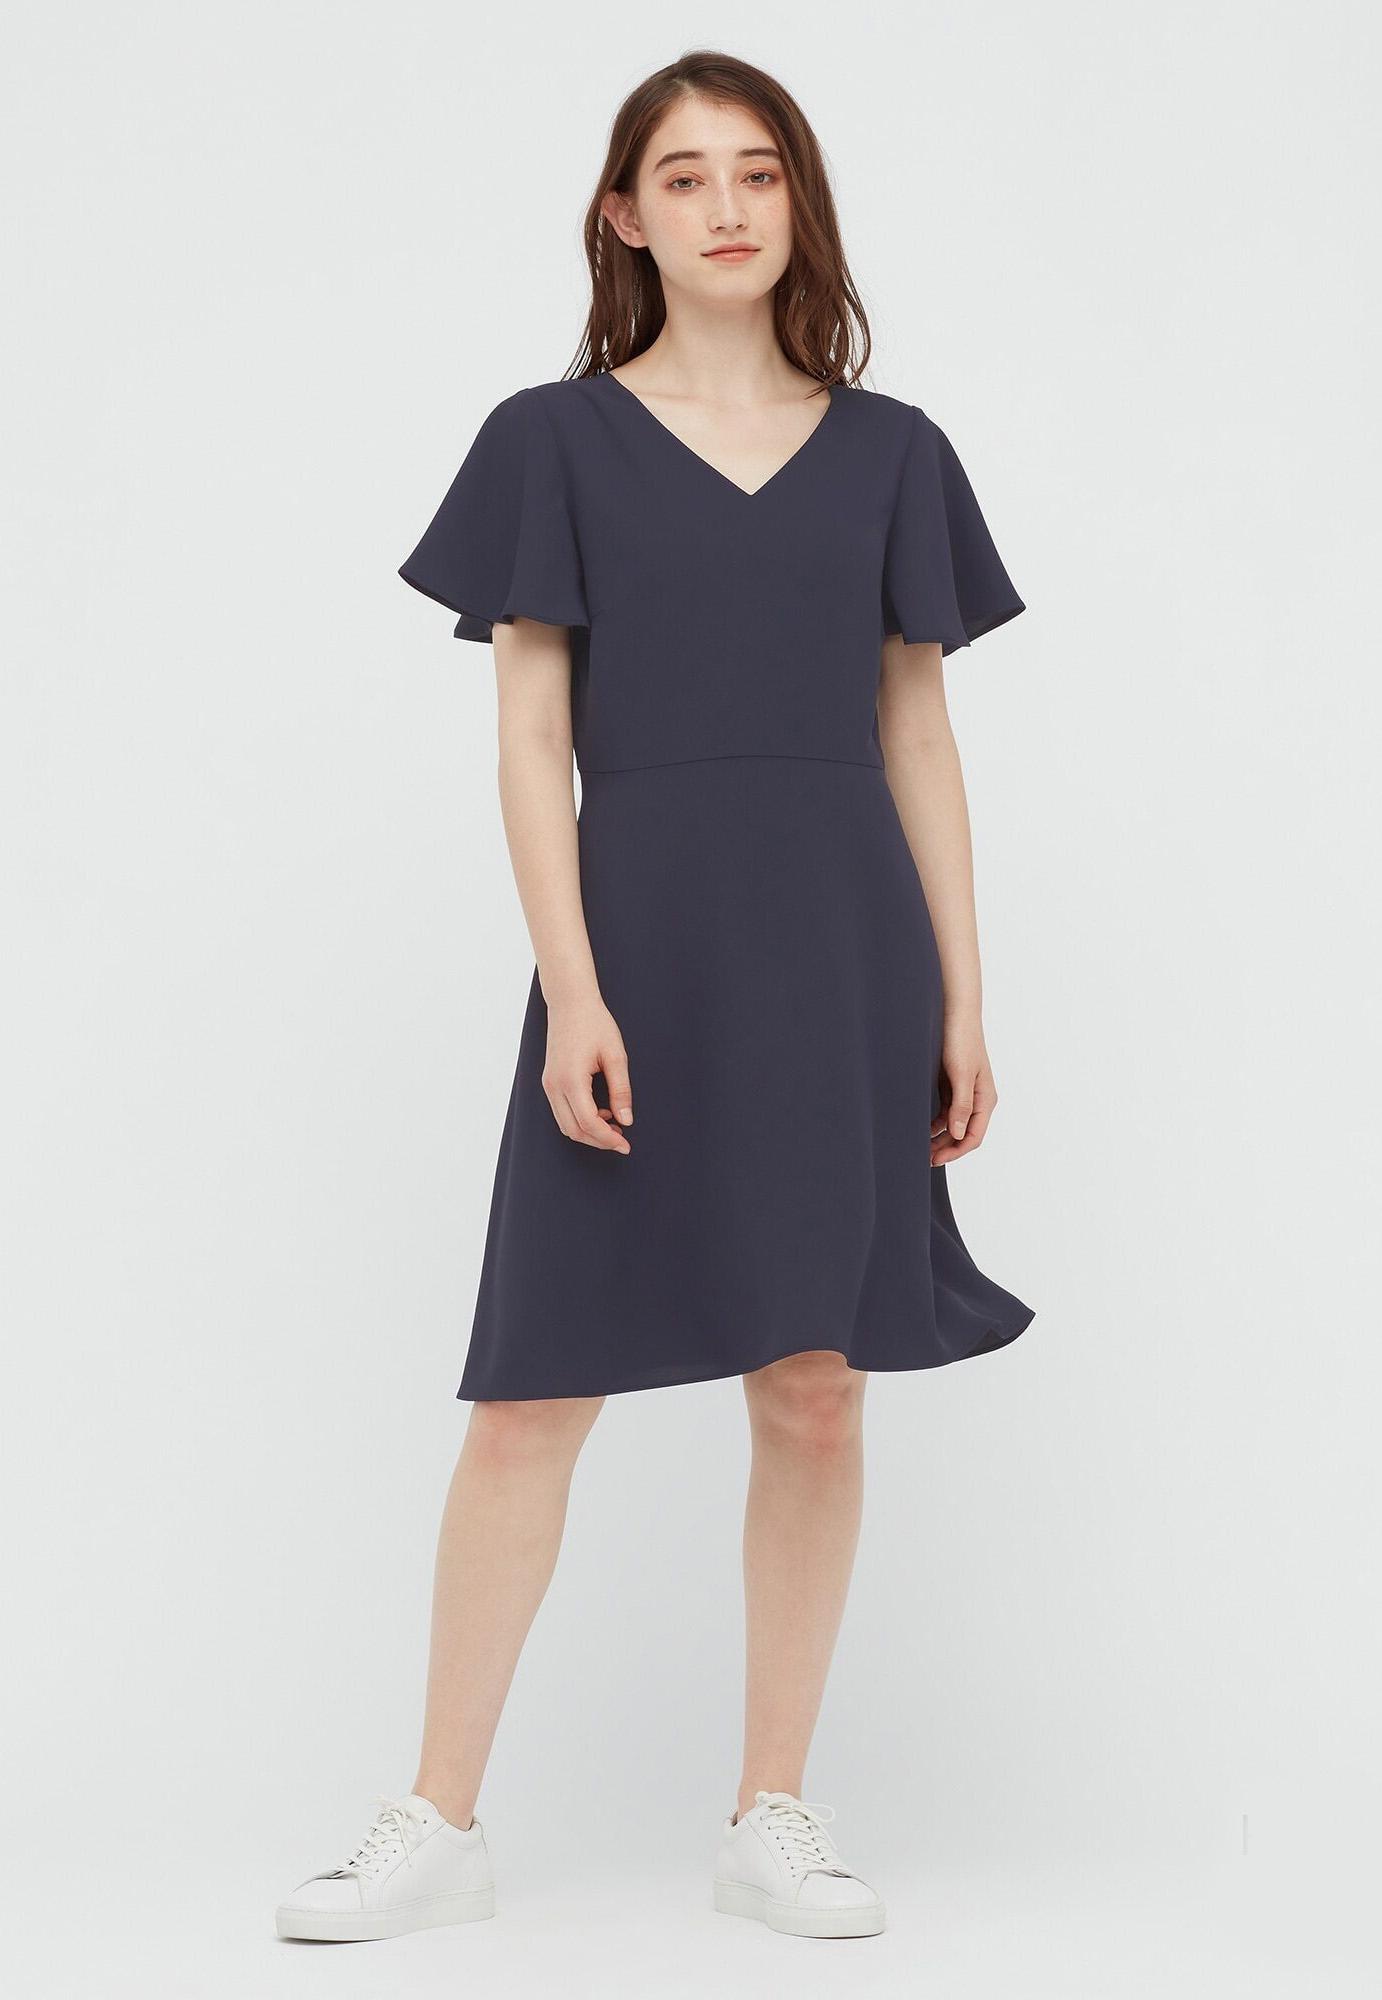 model gaun wanita